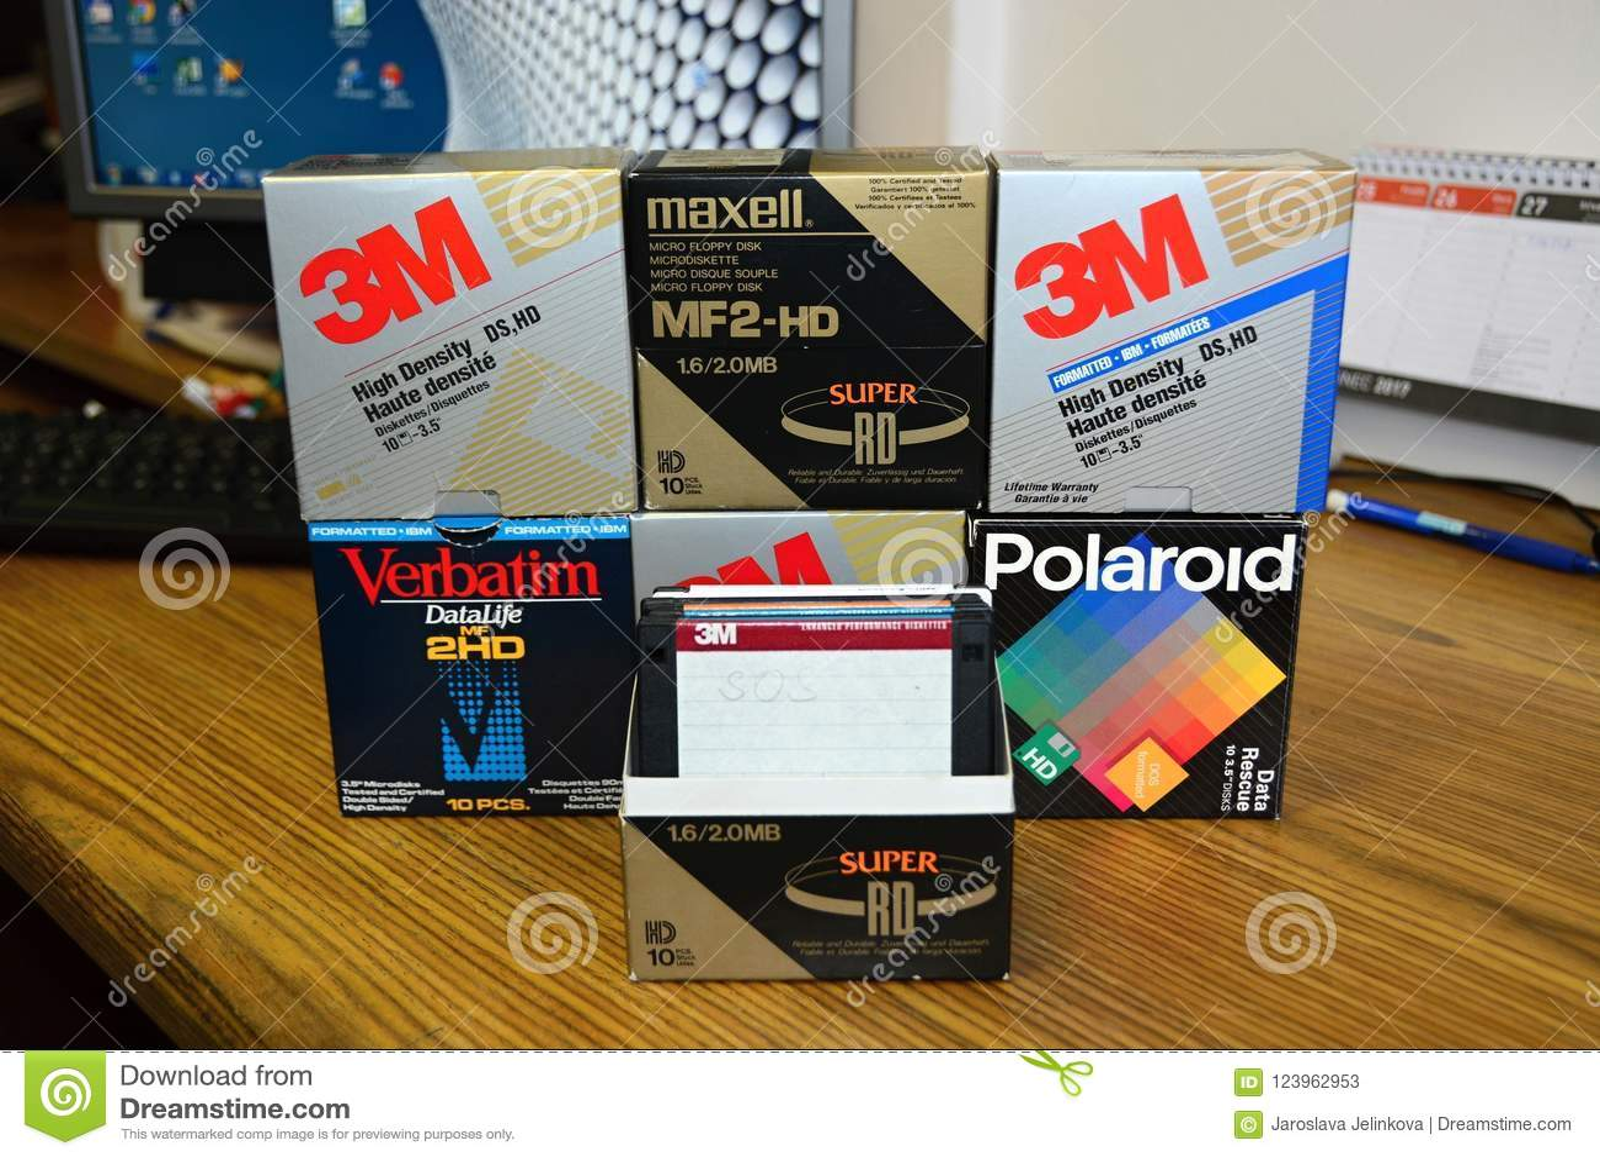 Dyskietki 3 5 3M `, Zastenografowany, maxell, polaroid